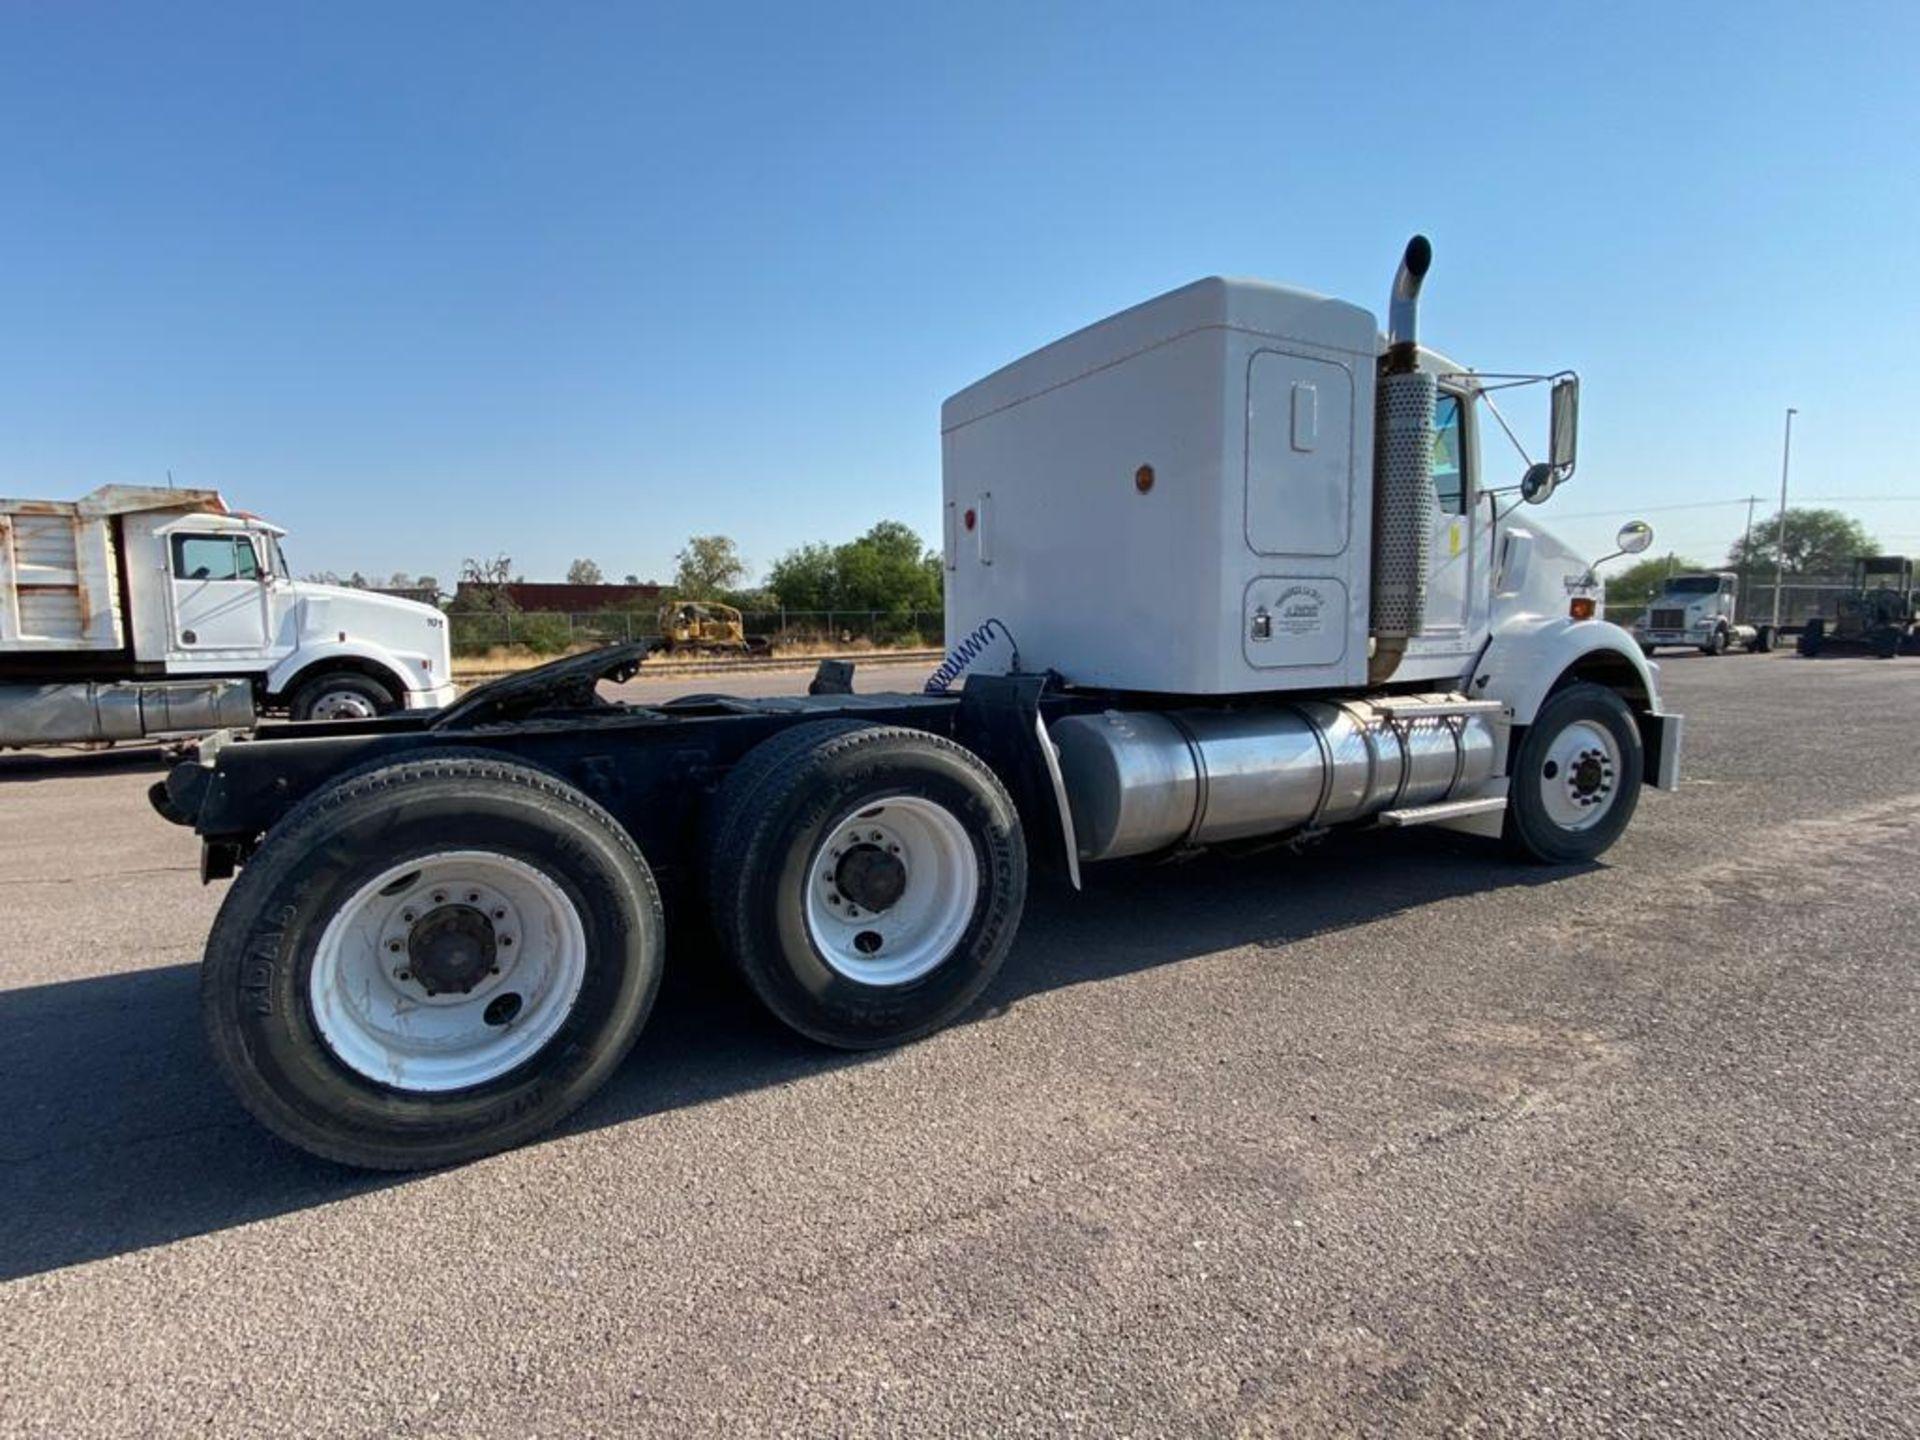 1998 Kenworth Sleeper Truck Tractor, standard transmission of 18 speeds - Image 15 of 55